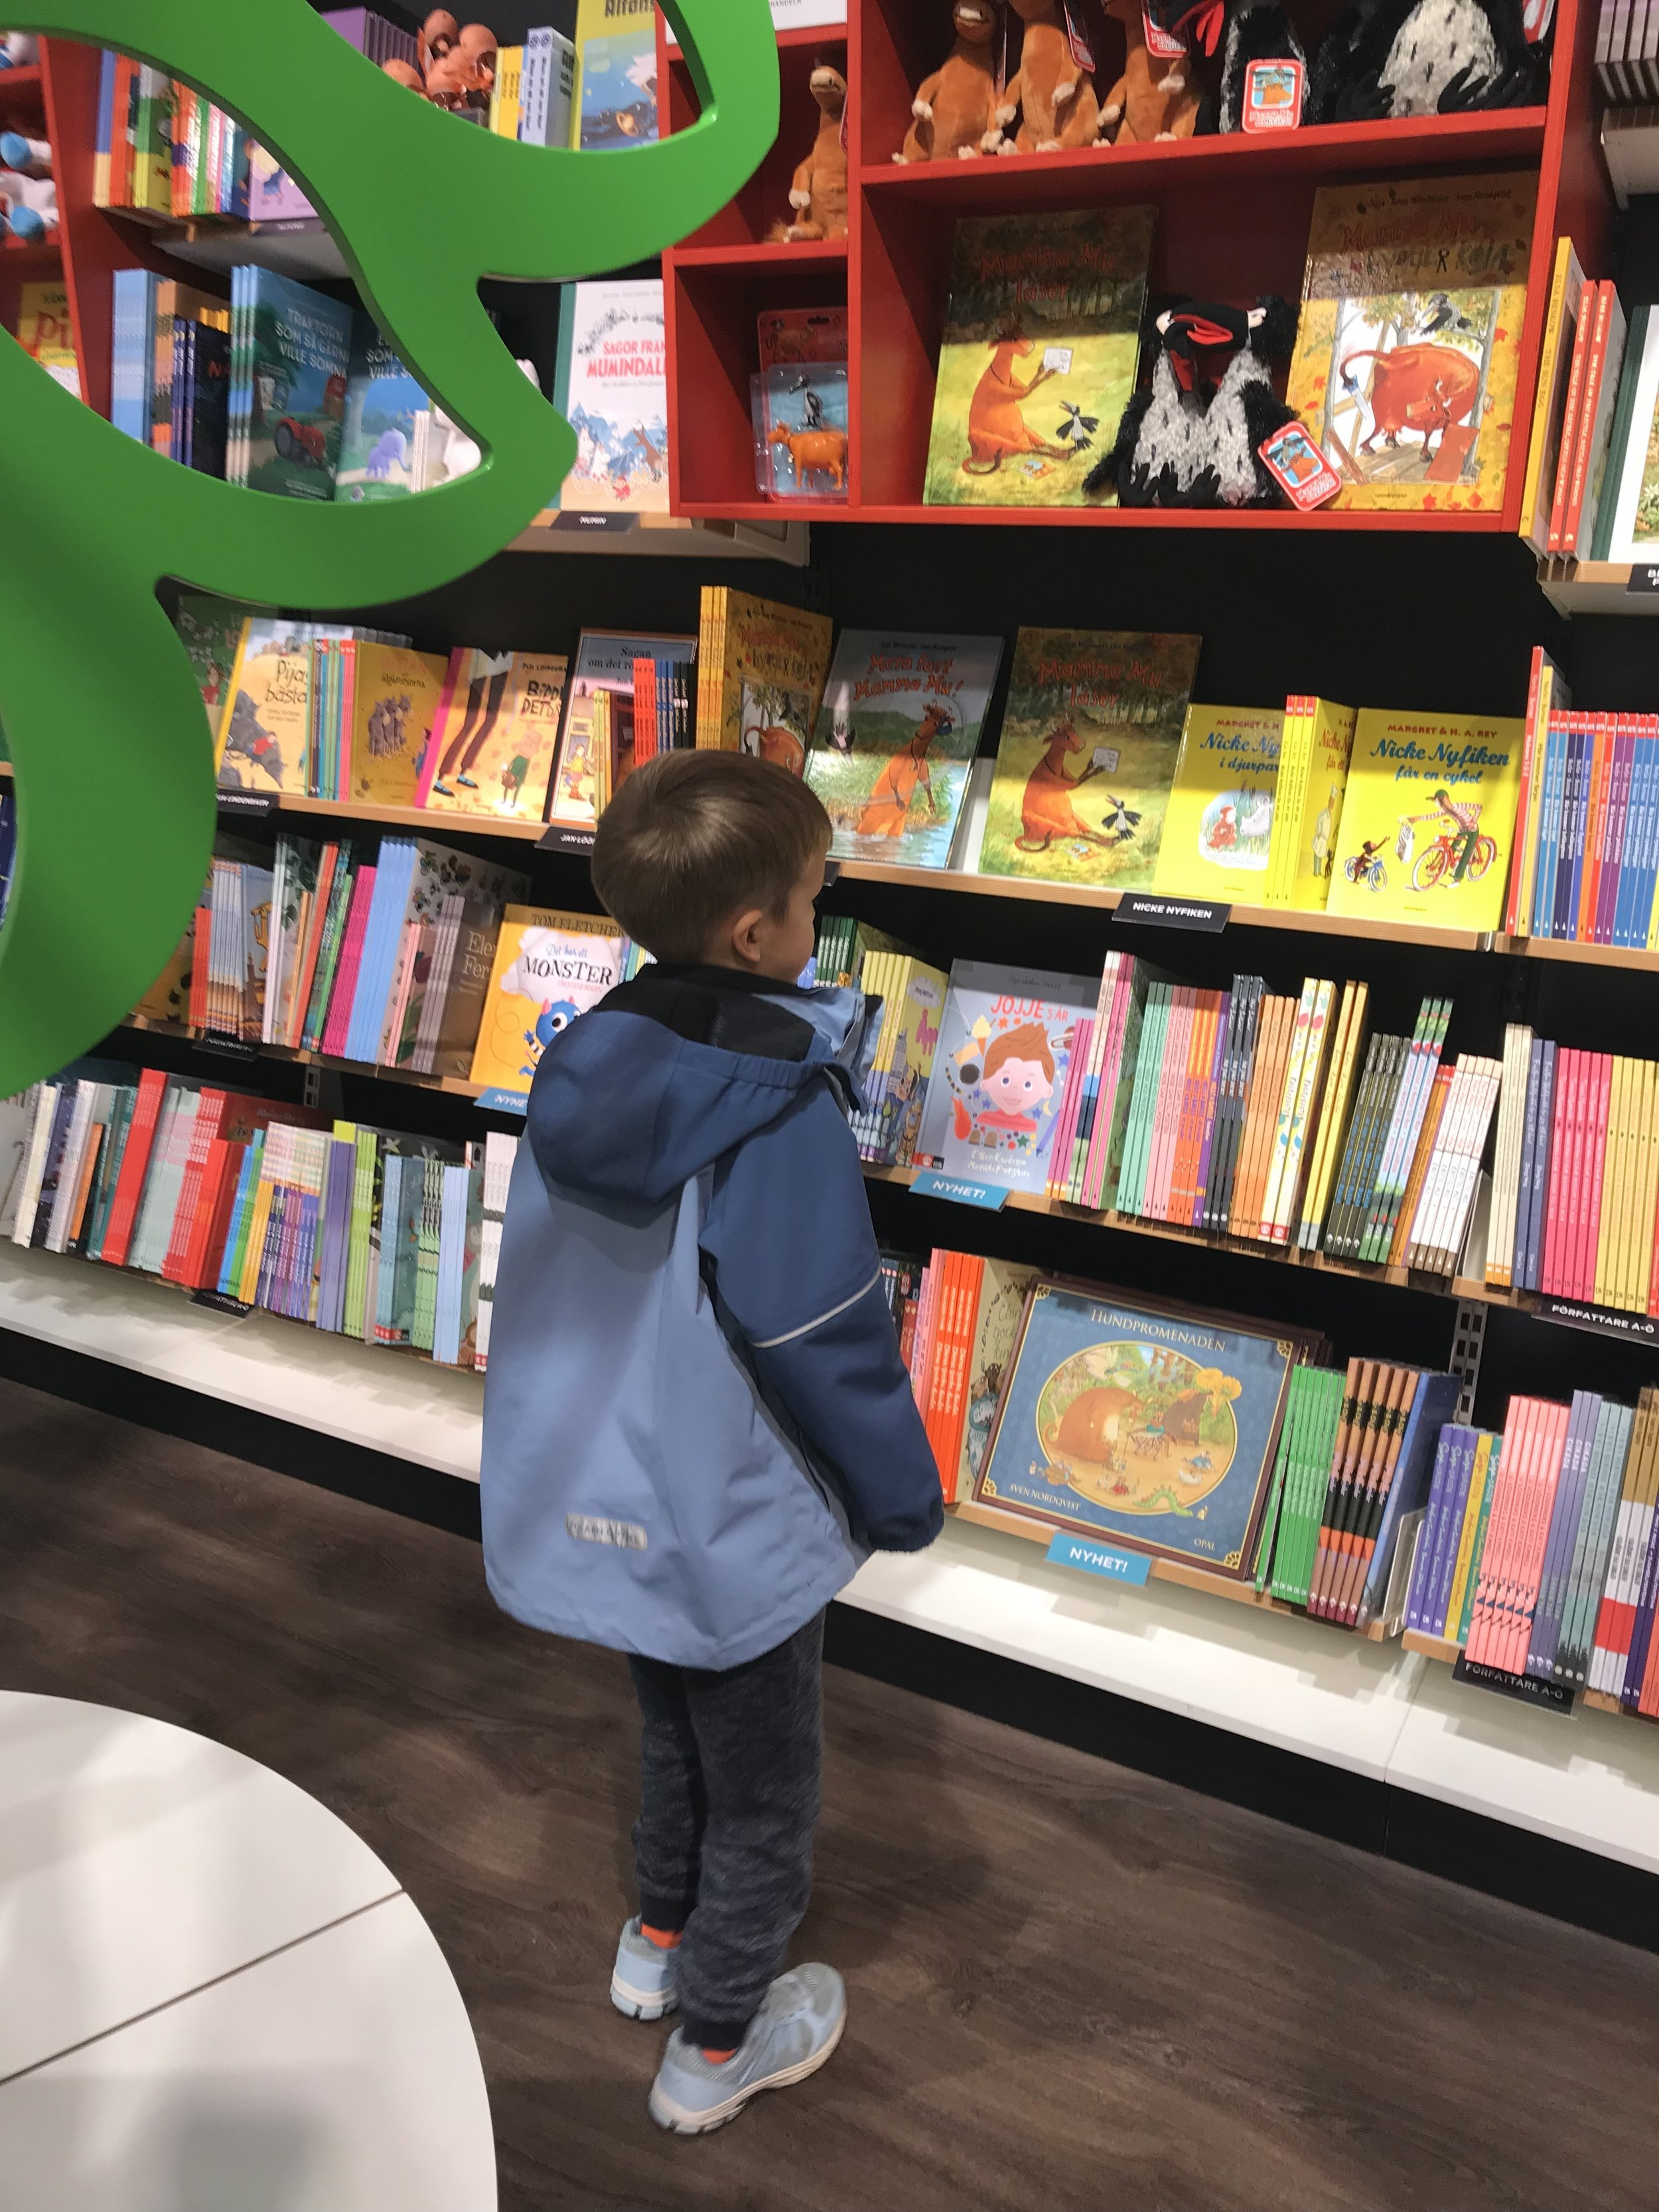 At the library. 📷 Rikke Hjuler